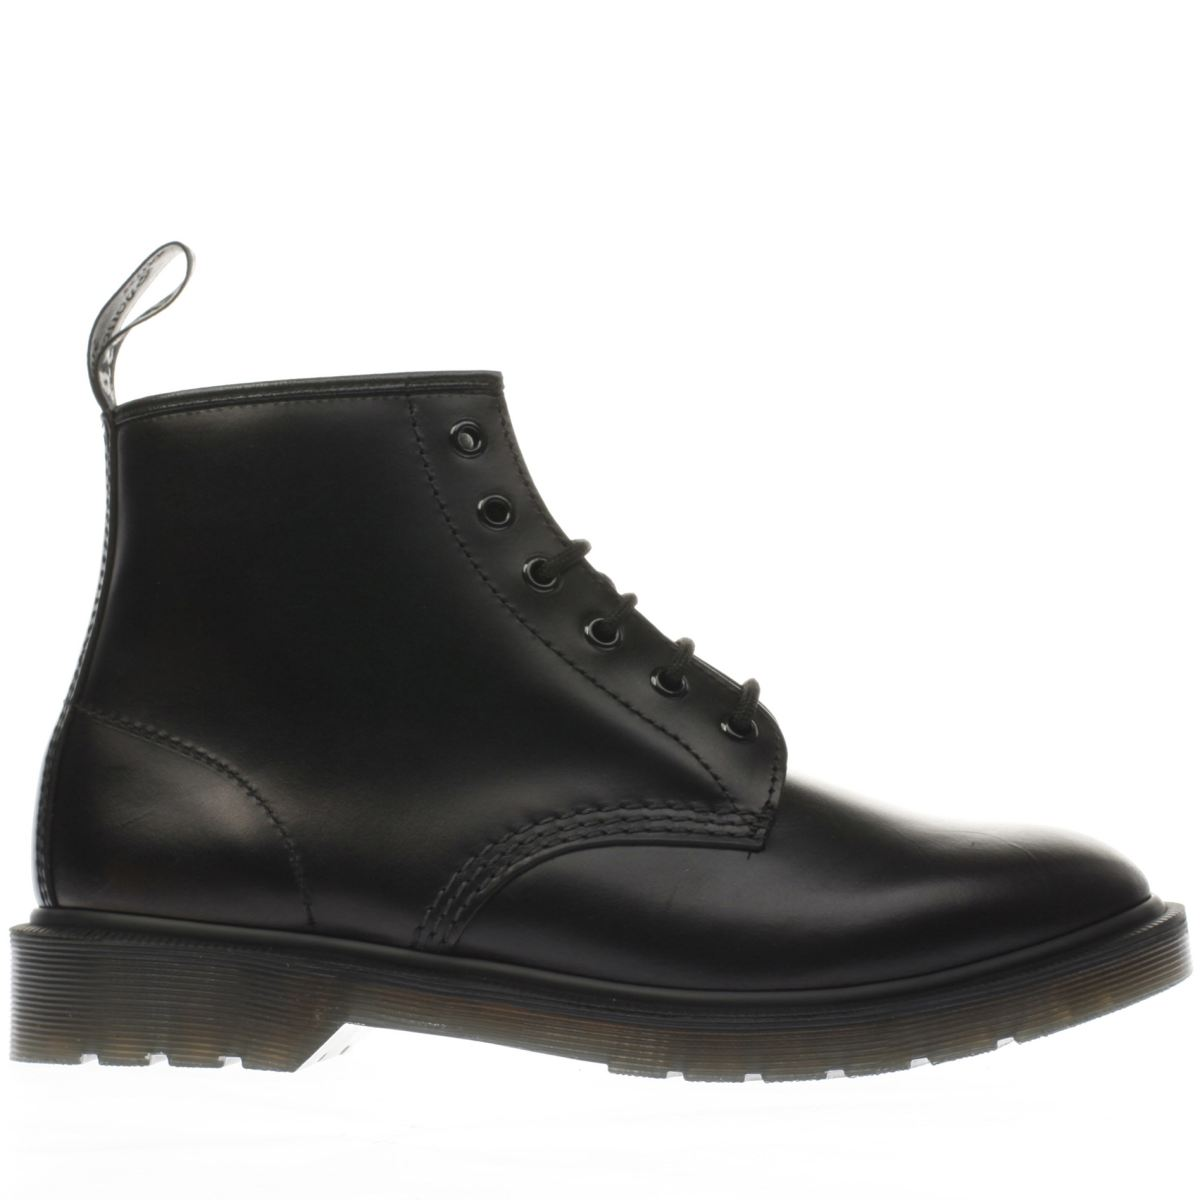 dr martens black 101 brando 6 eye boots